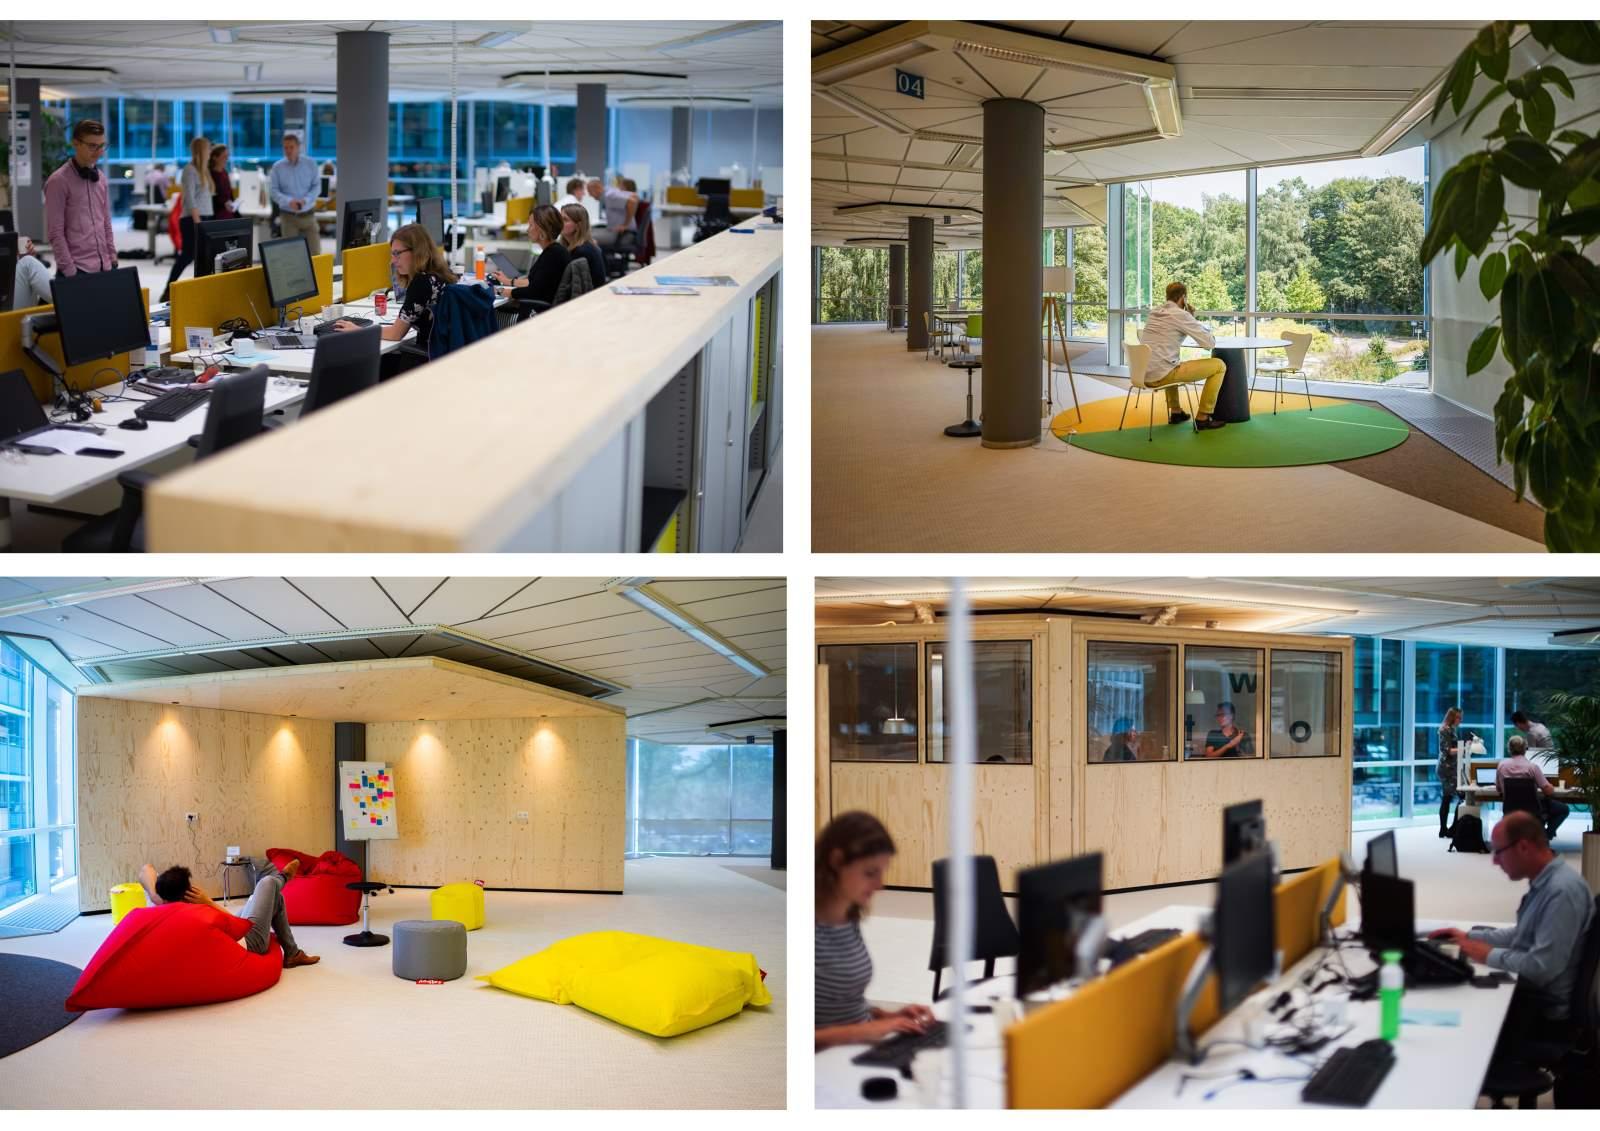 Renovation of our Royal HaskoningDHV headquarters, Amersfoort